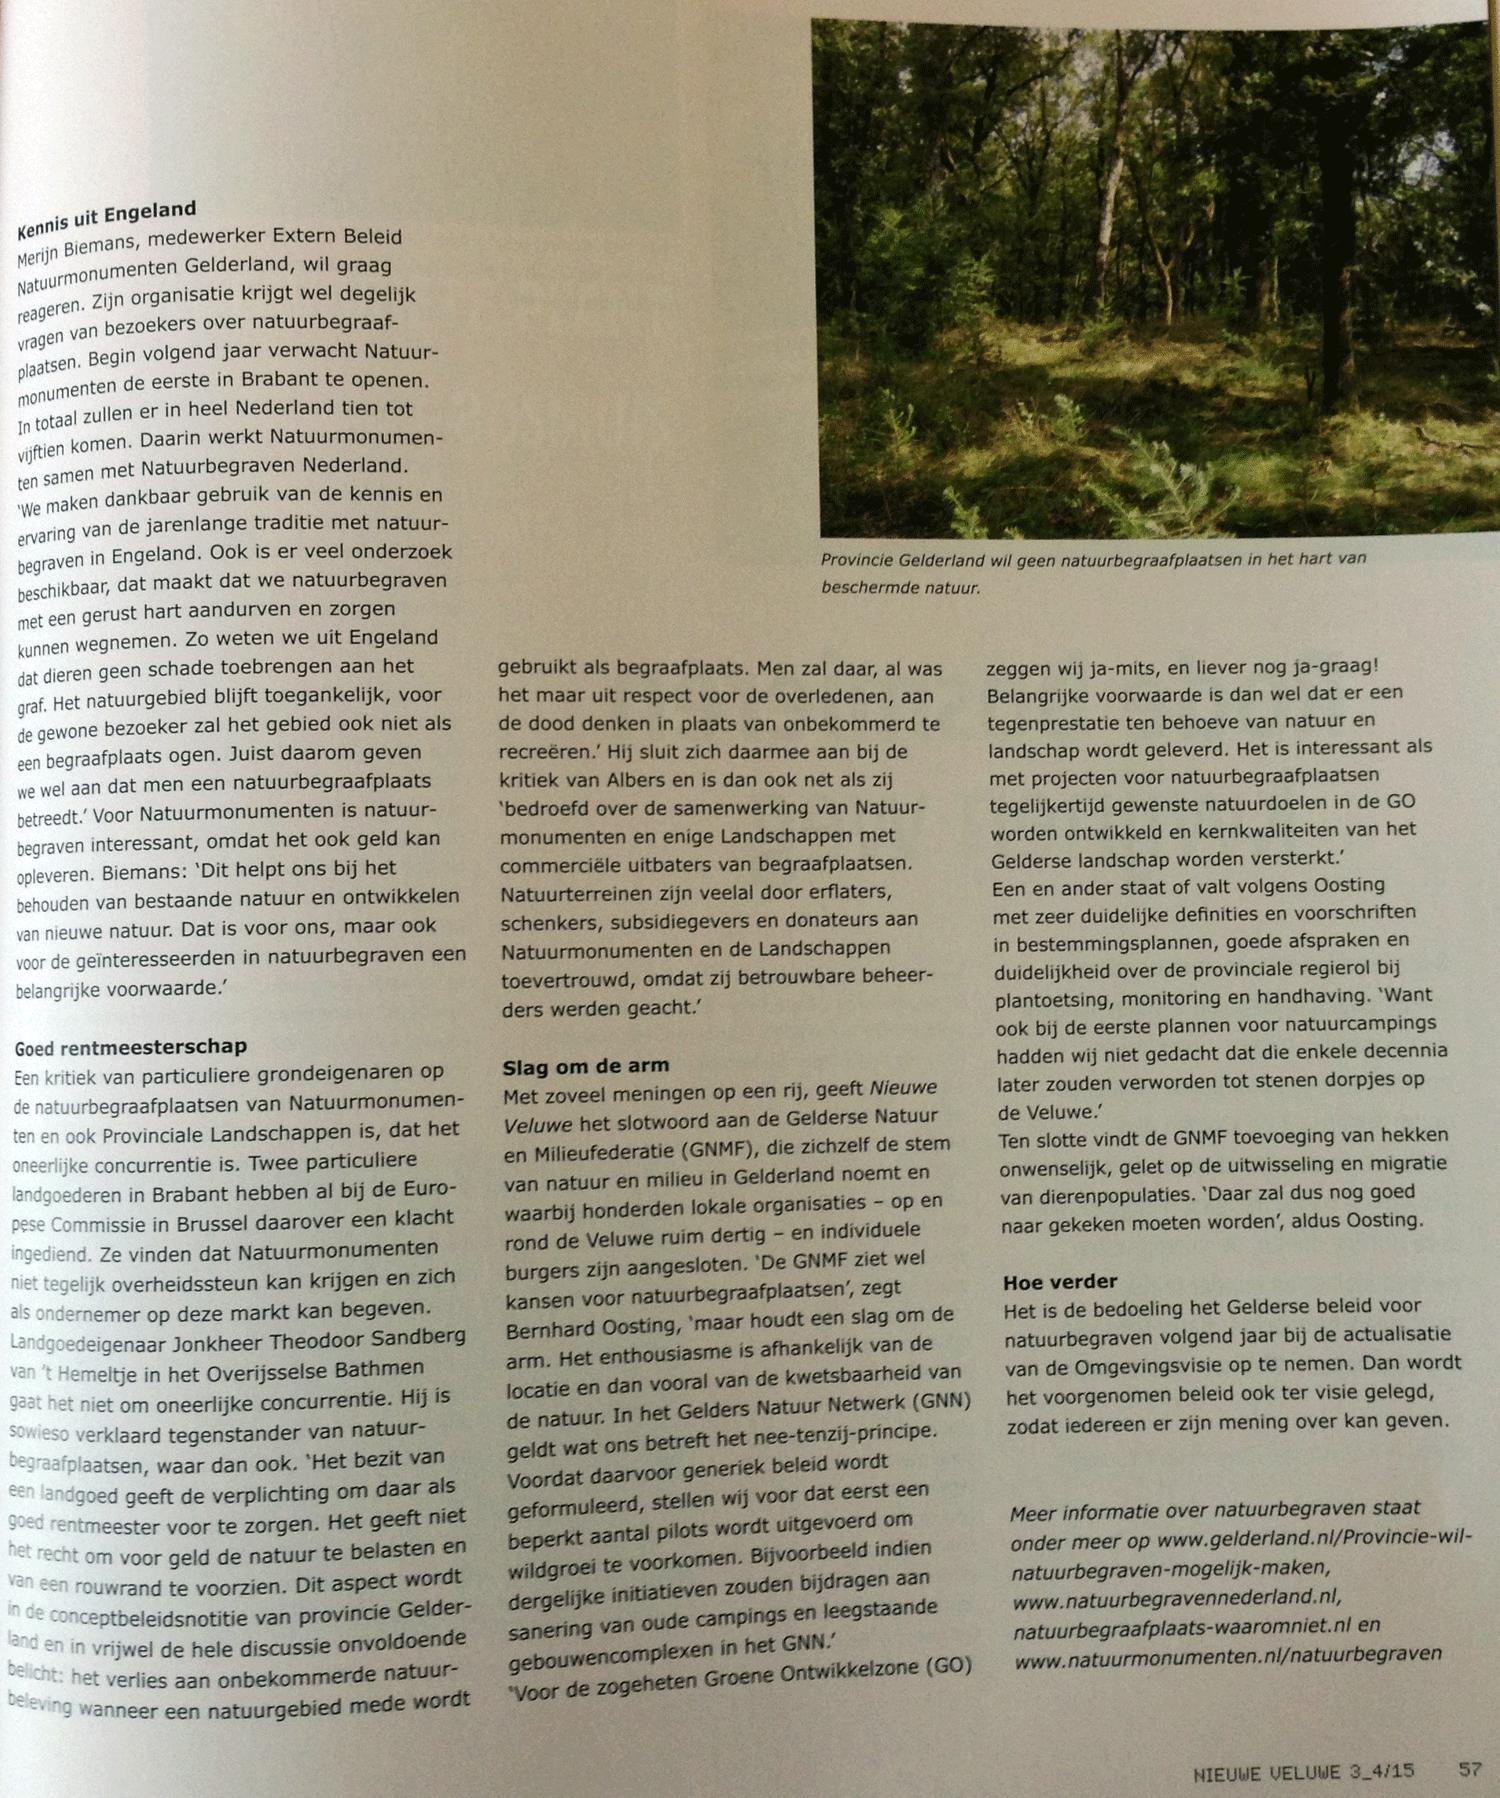 Opgaan in de natuur pagina 57